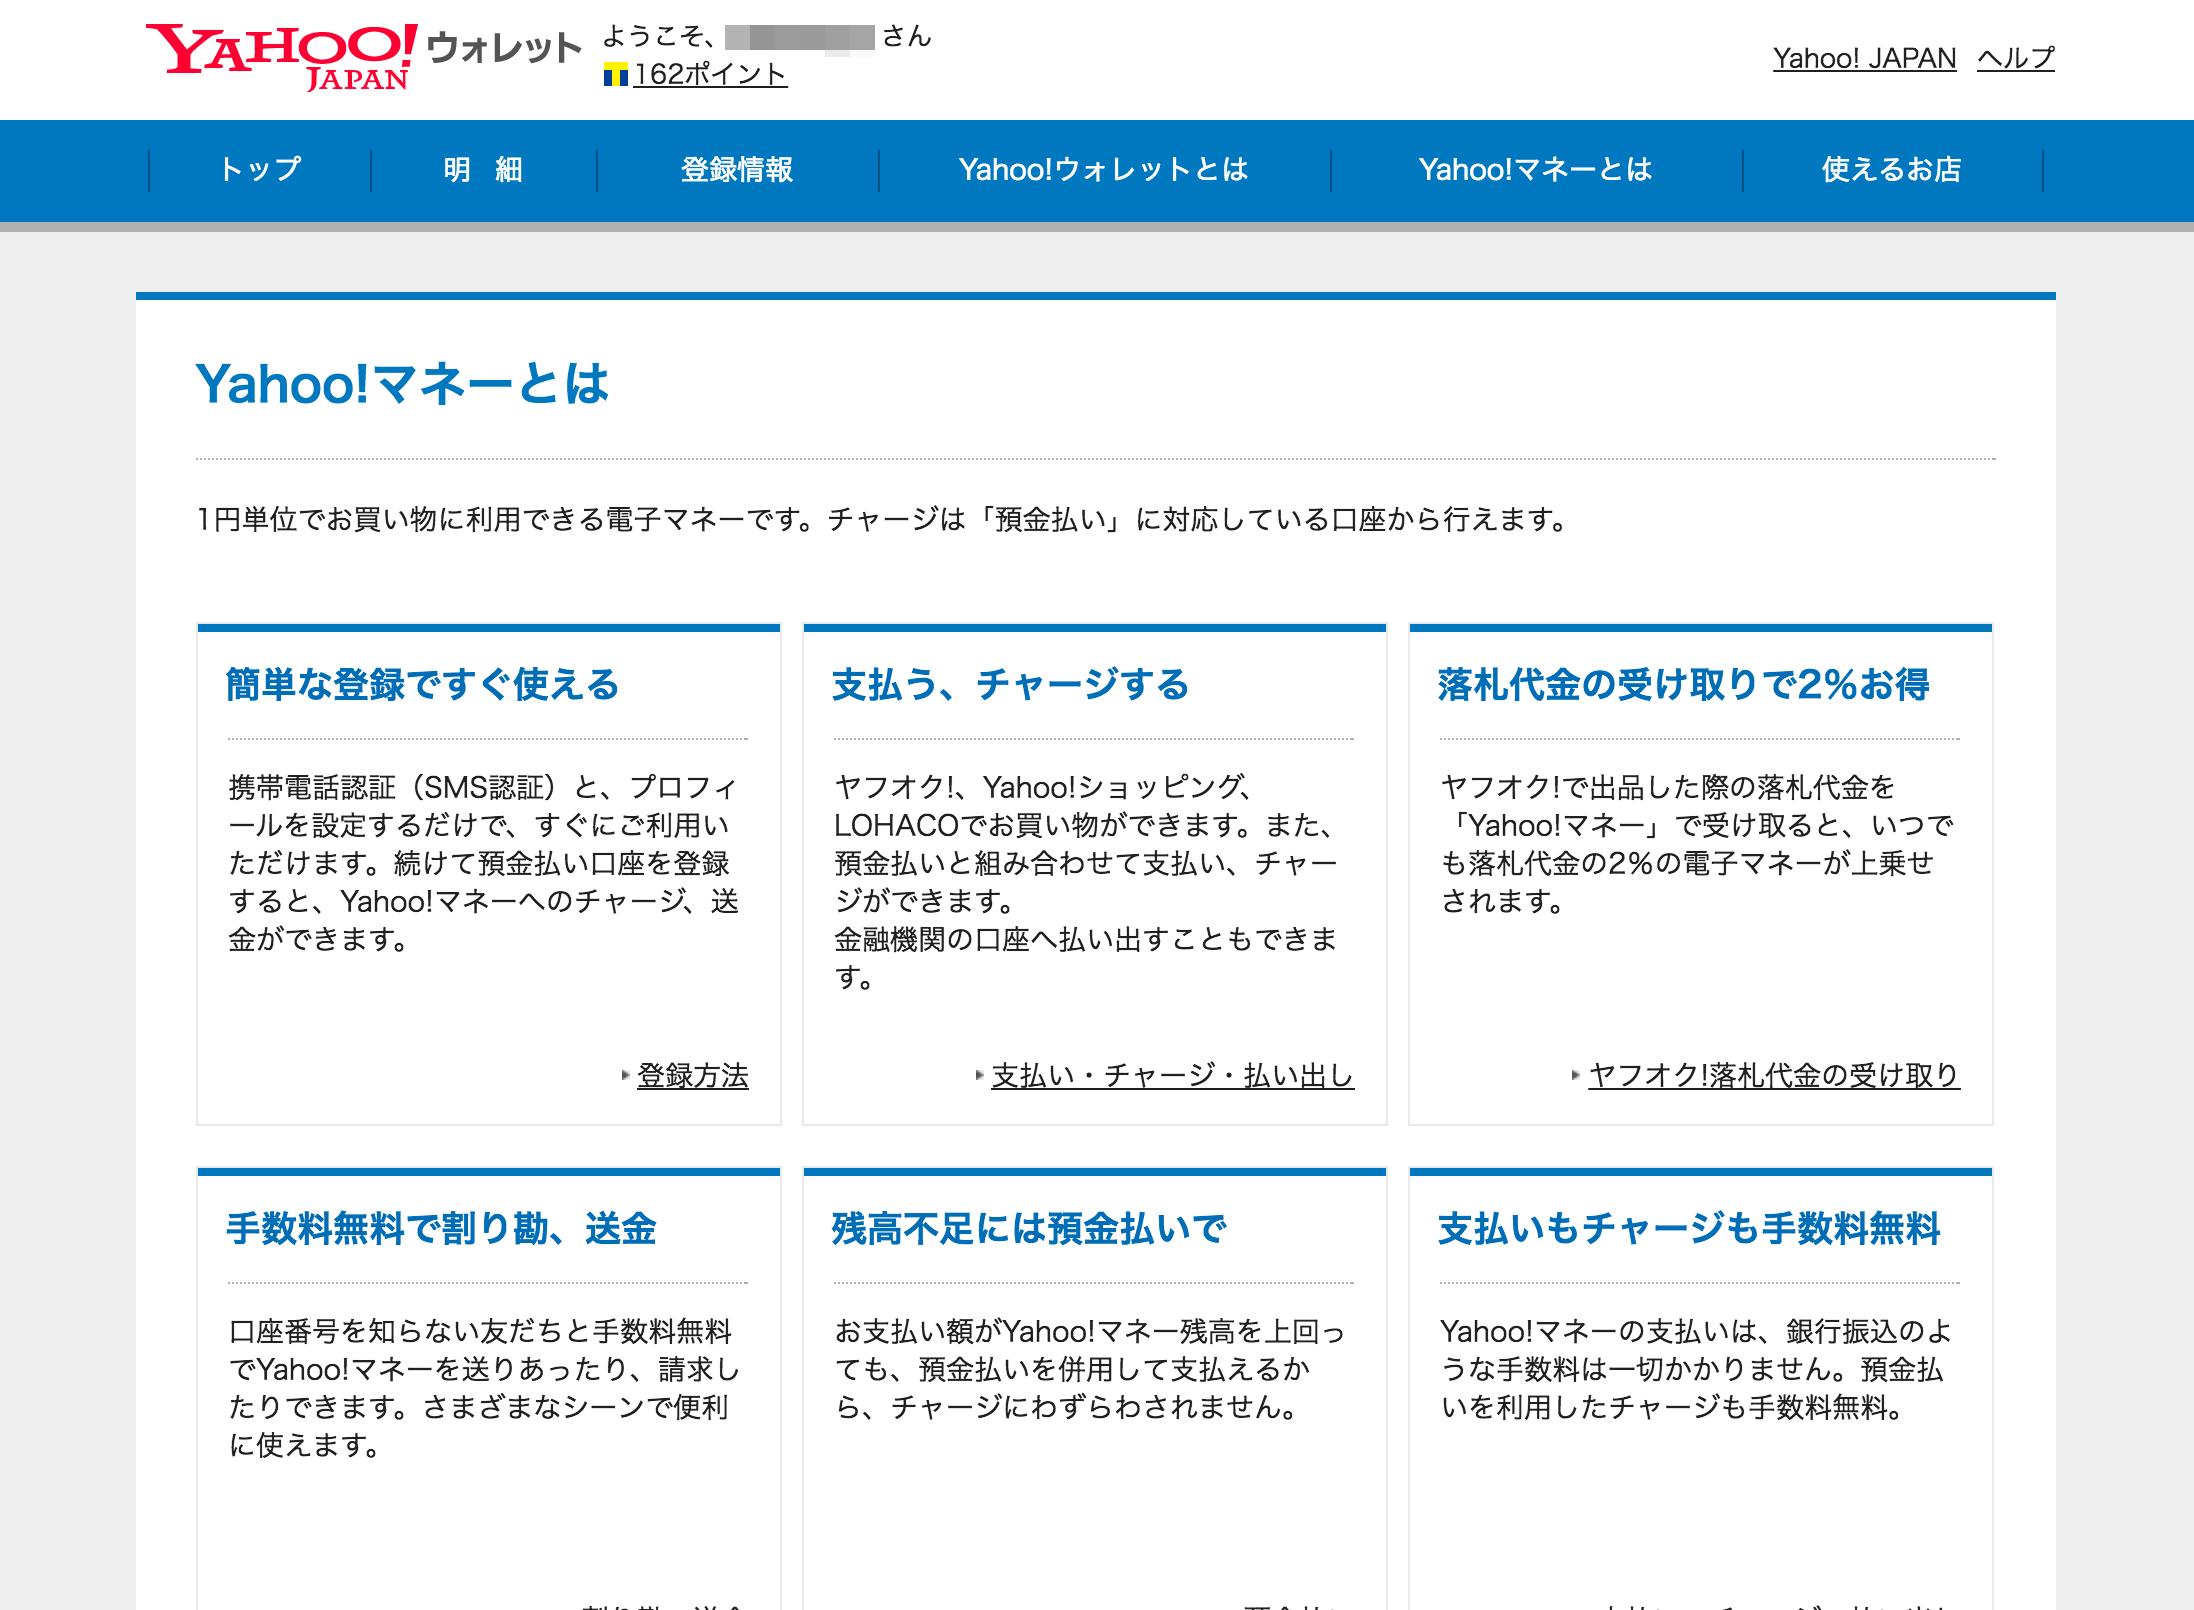 「Yahoo!マネー」